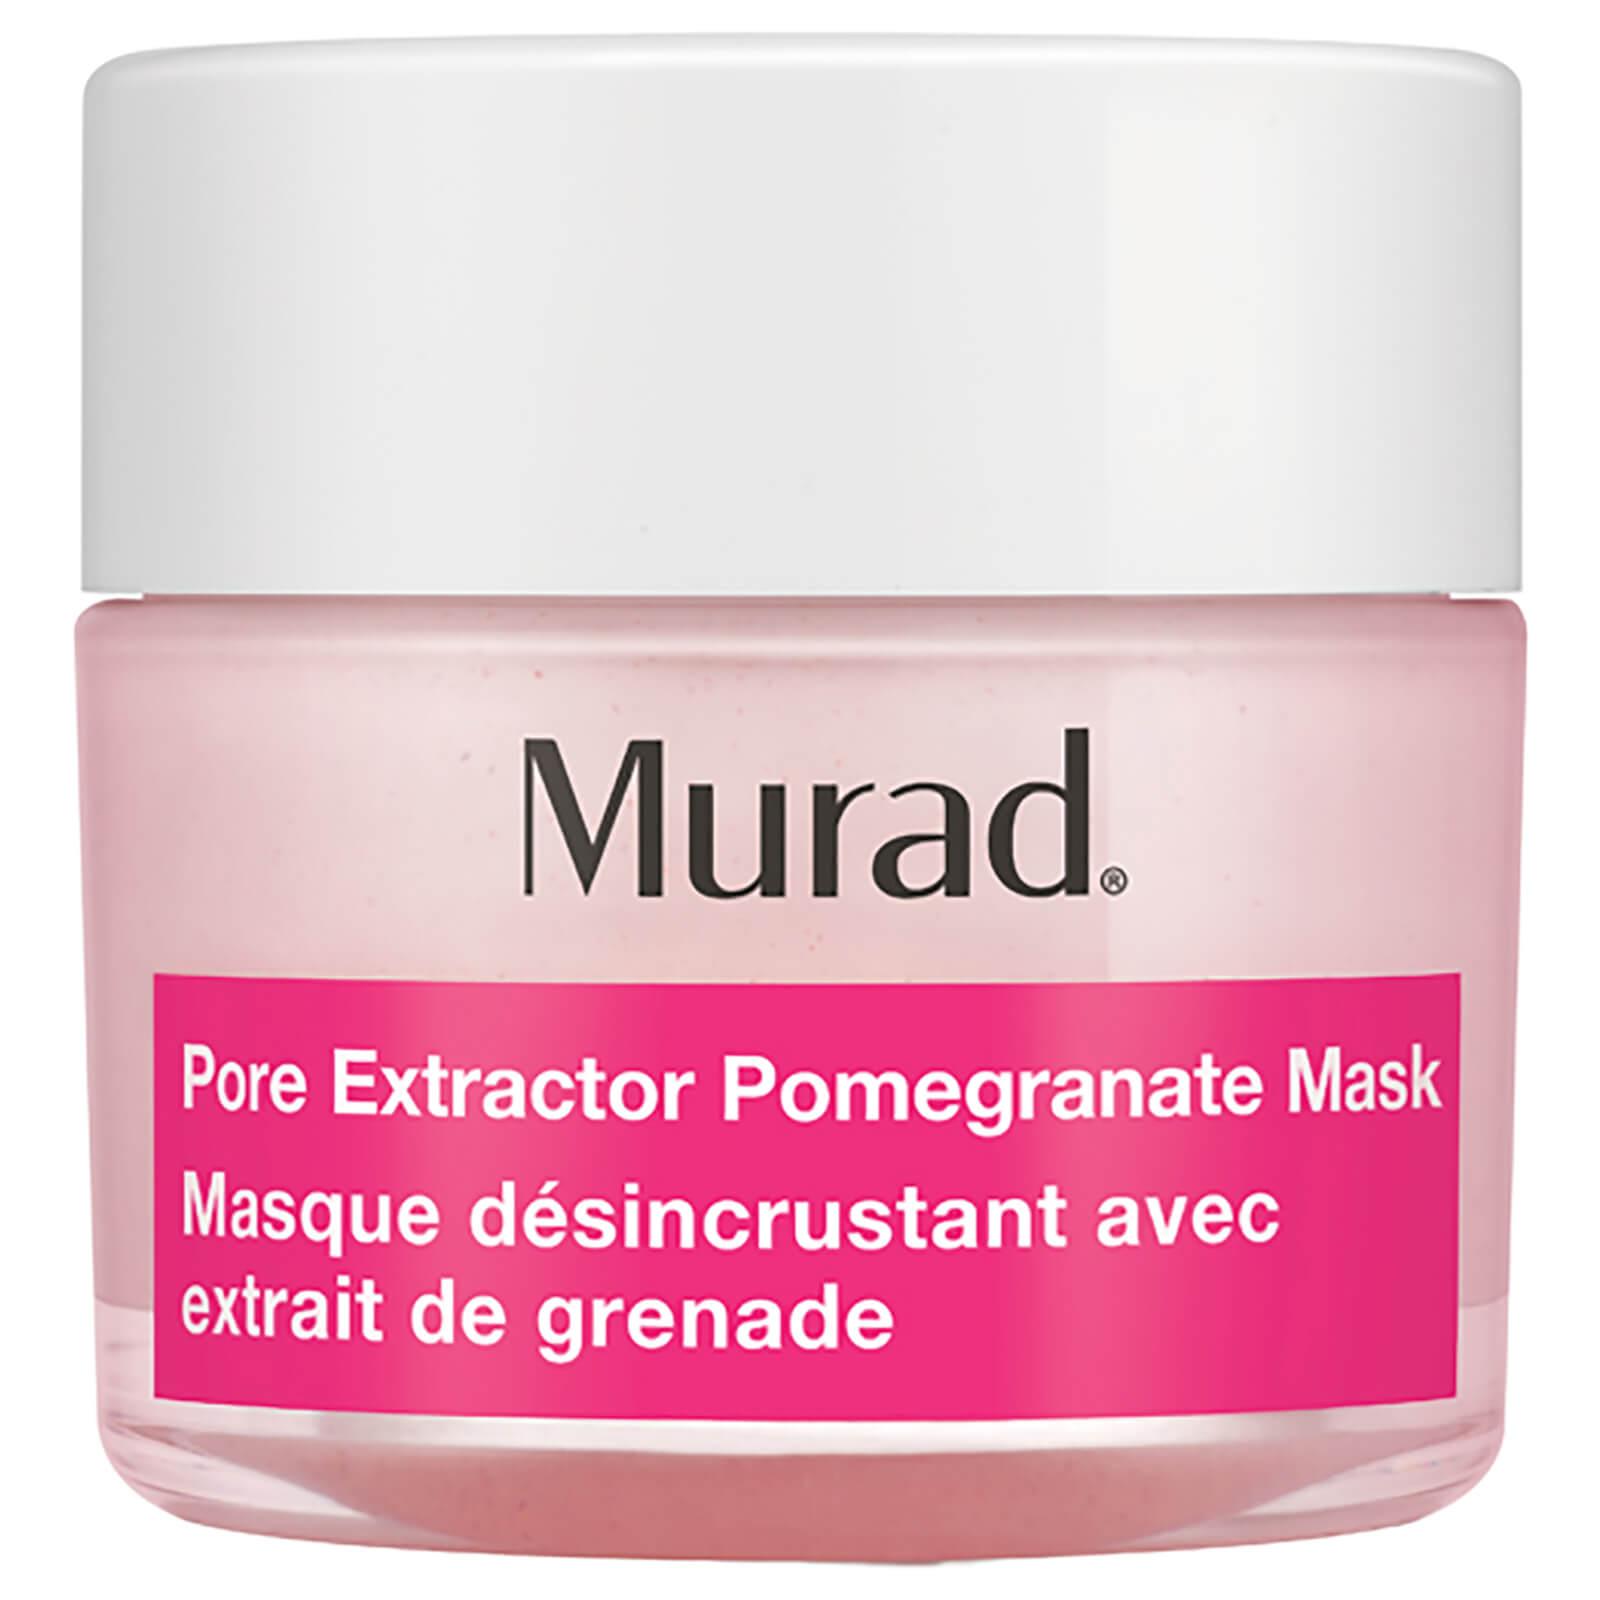 Murad Mascarilla de granada para extracción de poros Pore Extractor Pomegranate Mask de Murad